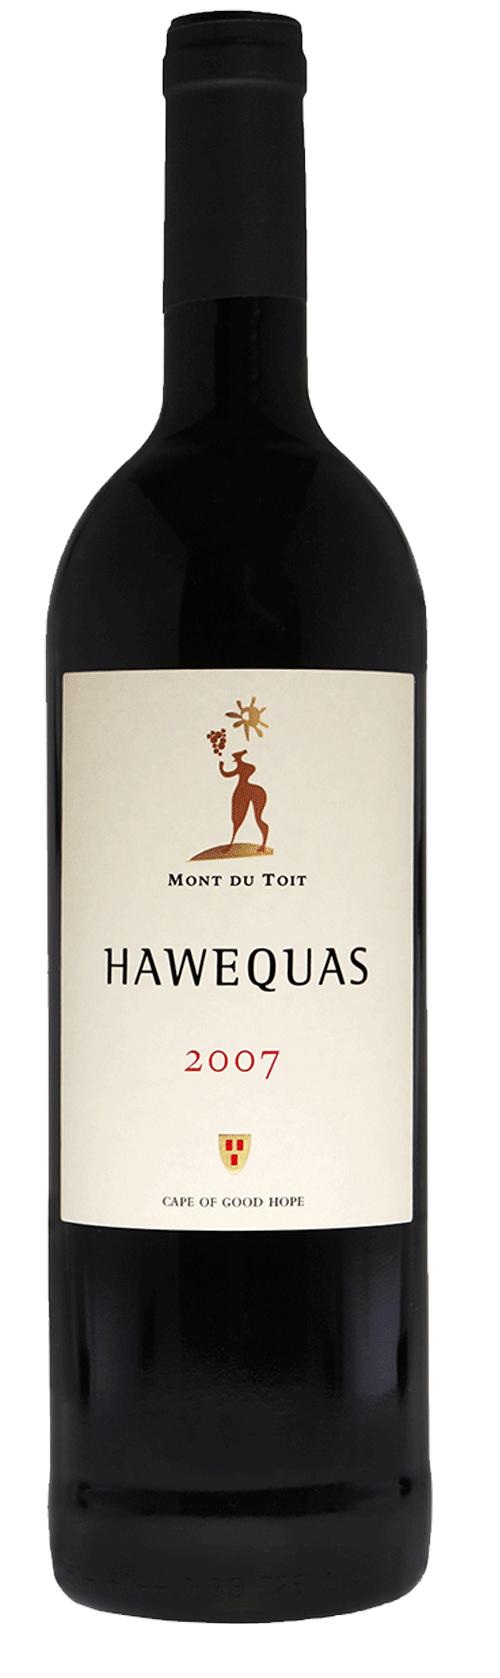 Hawequas 2007